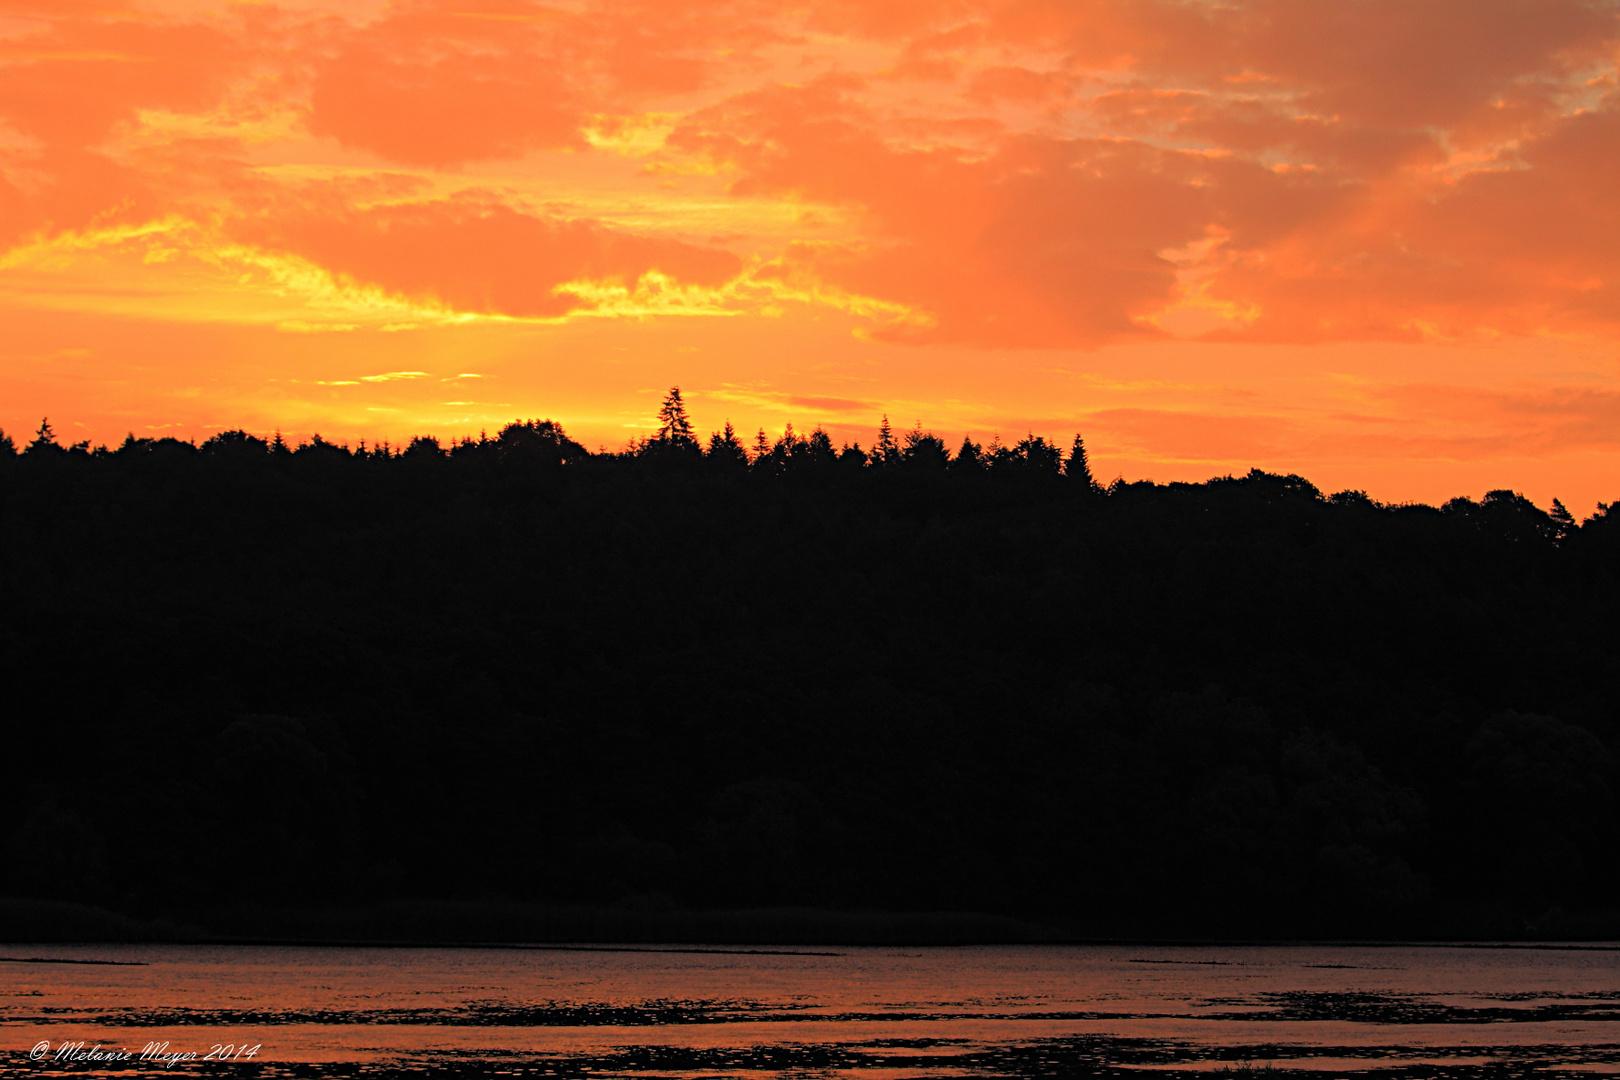 Sonnenaufgang 08.06.2014 (1)